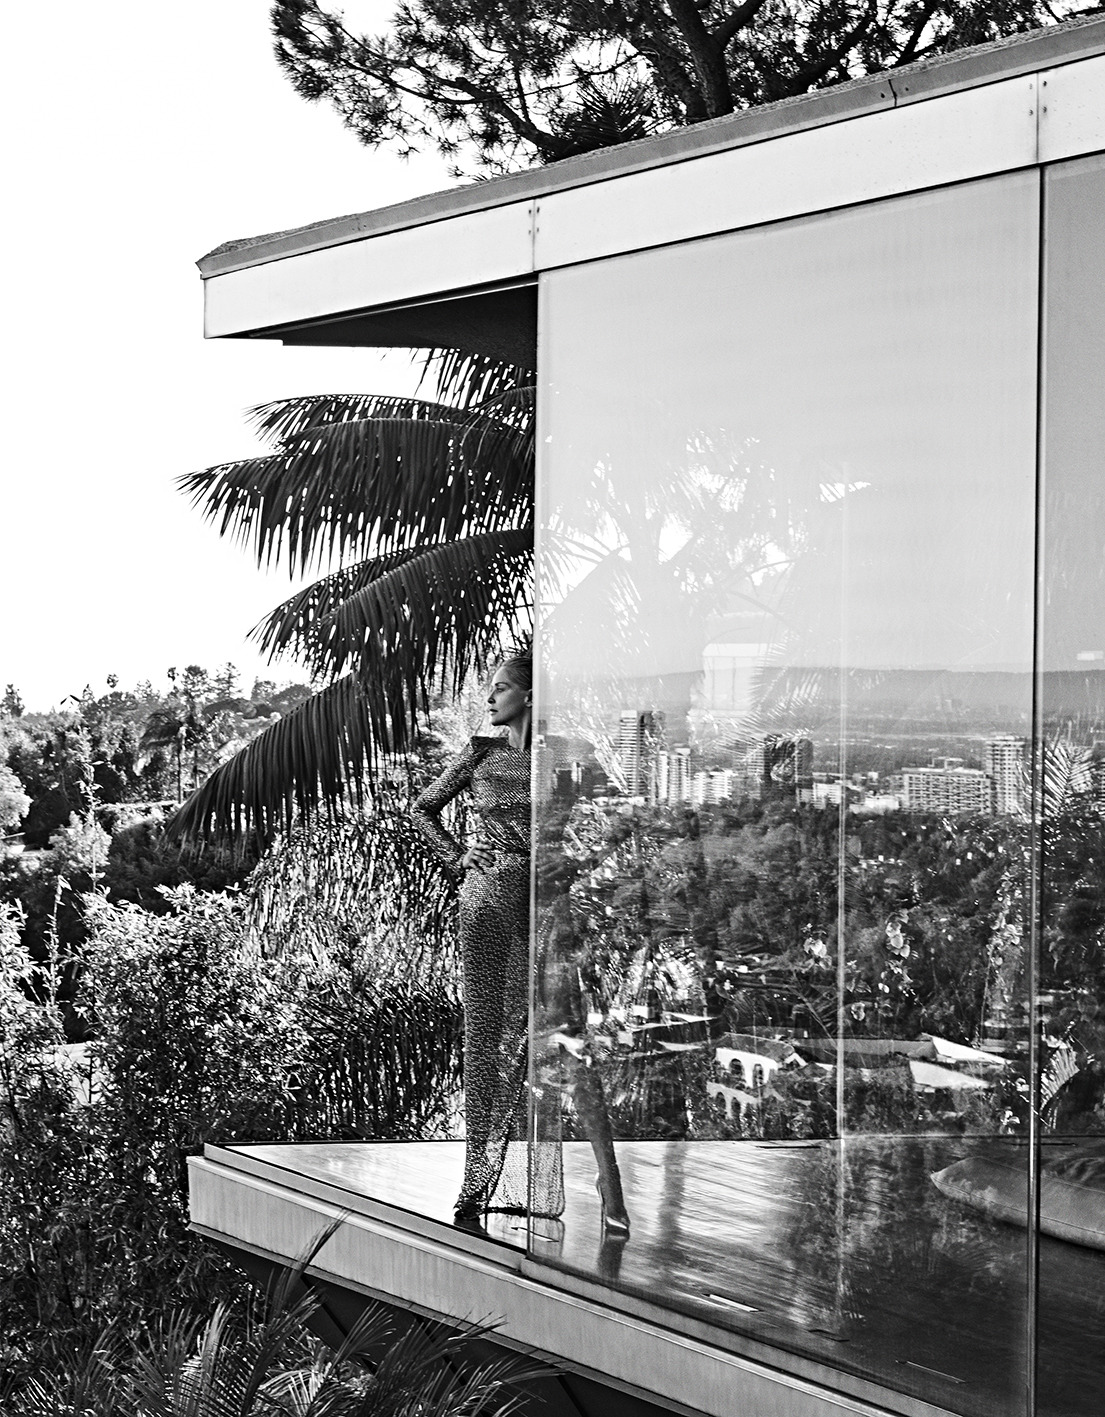 Sharon Stone by Branislav Simoncik for Vogue Portugal May 2019 (3).jpg